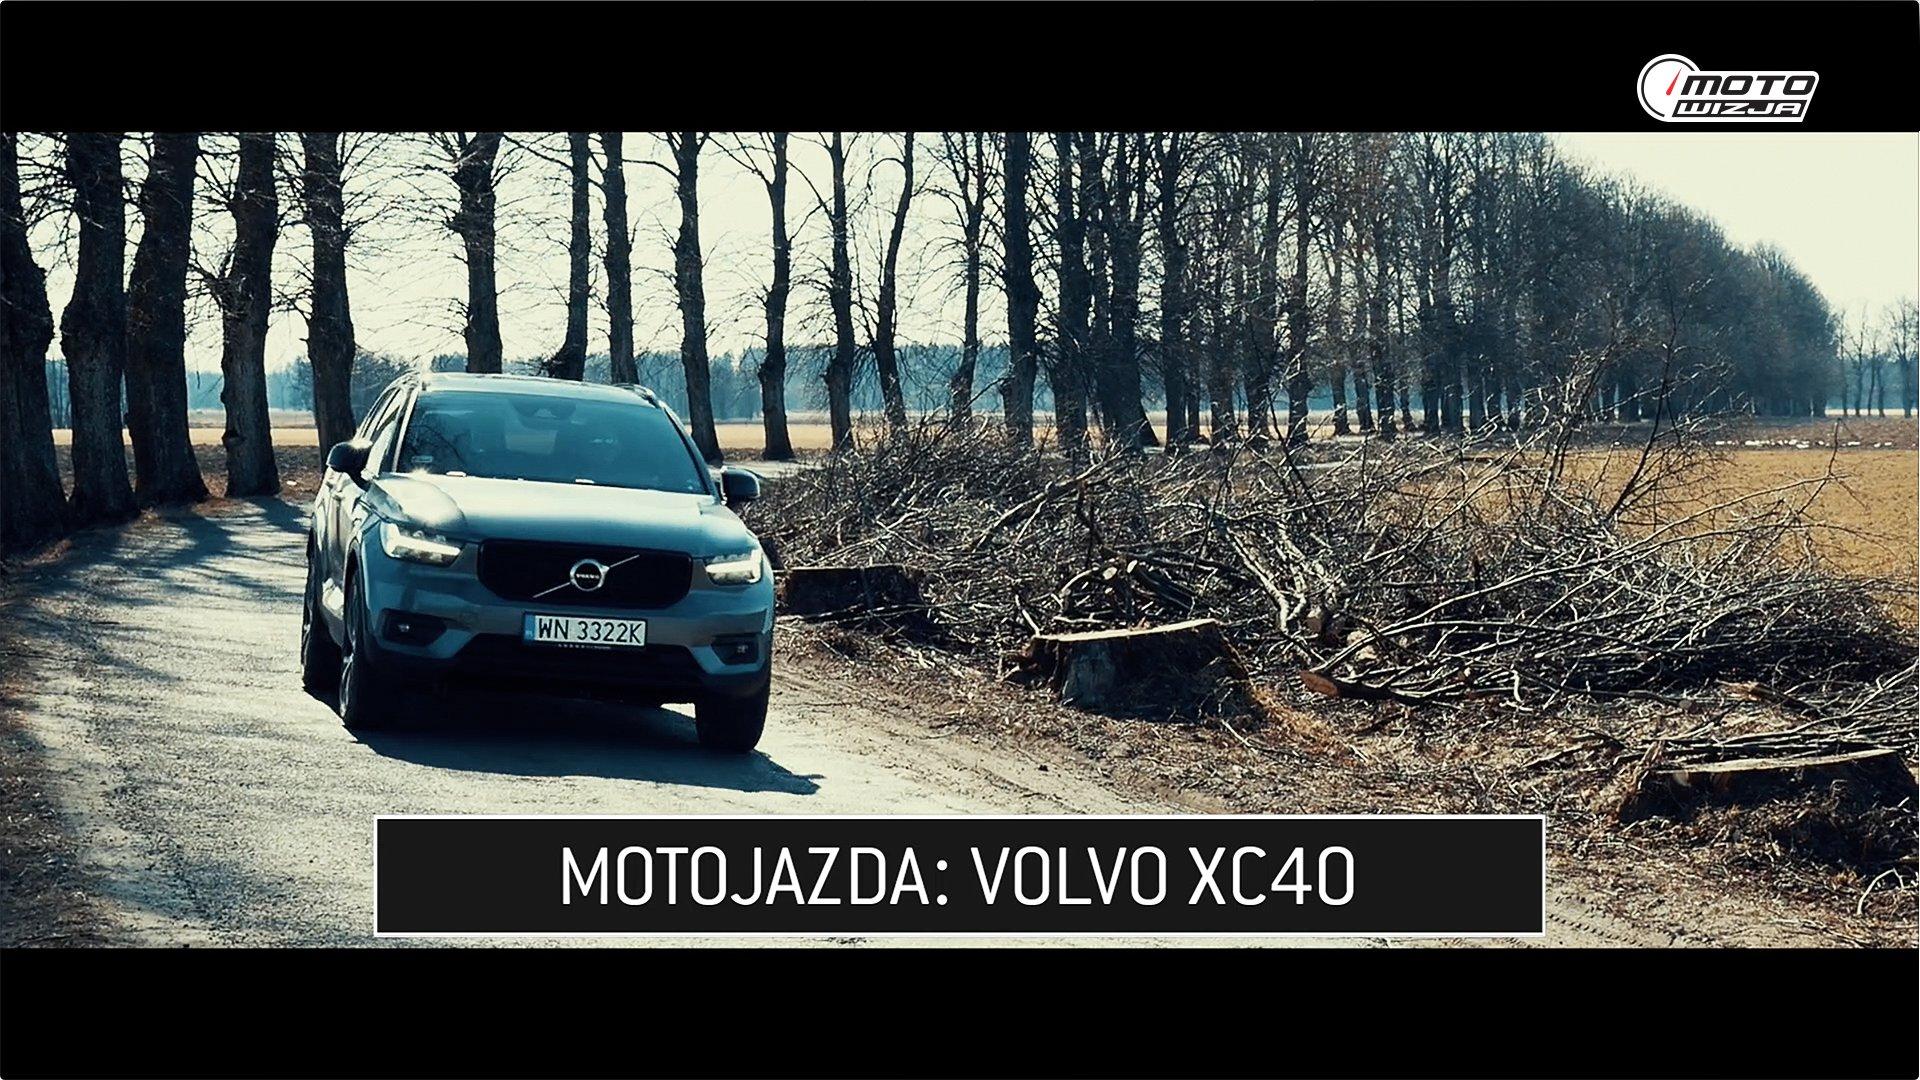 Motojazda w Motowizji: Volvo XC40